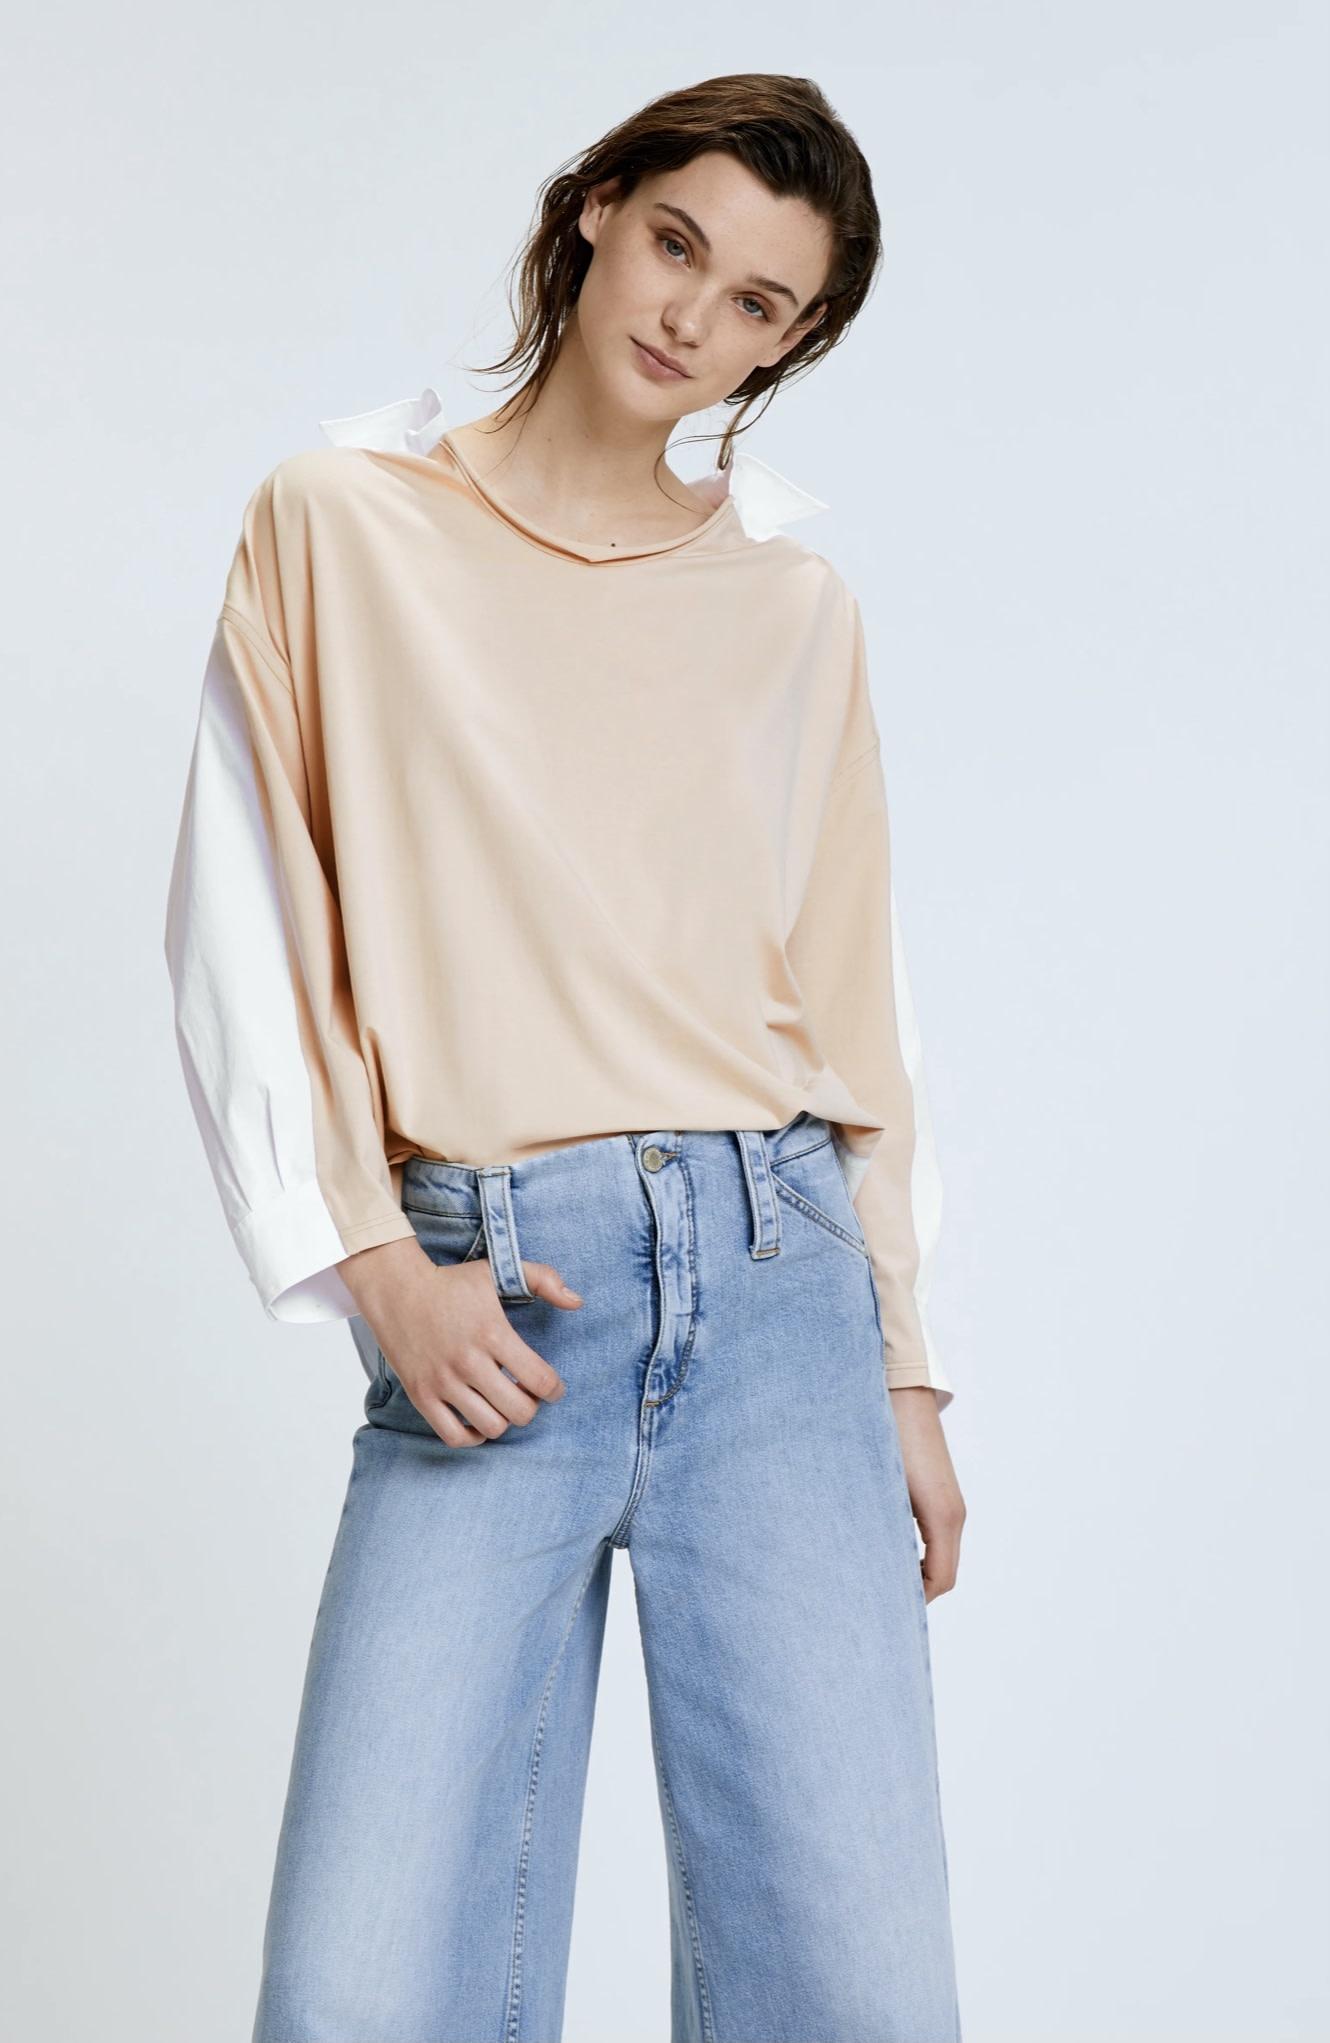 Cool contrast shirt dorothee schumacher-1